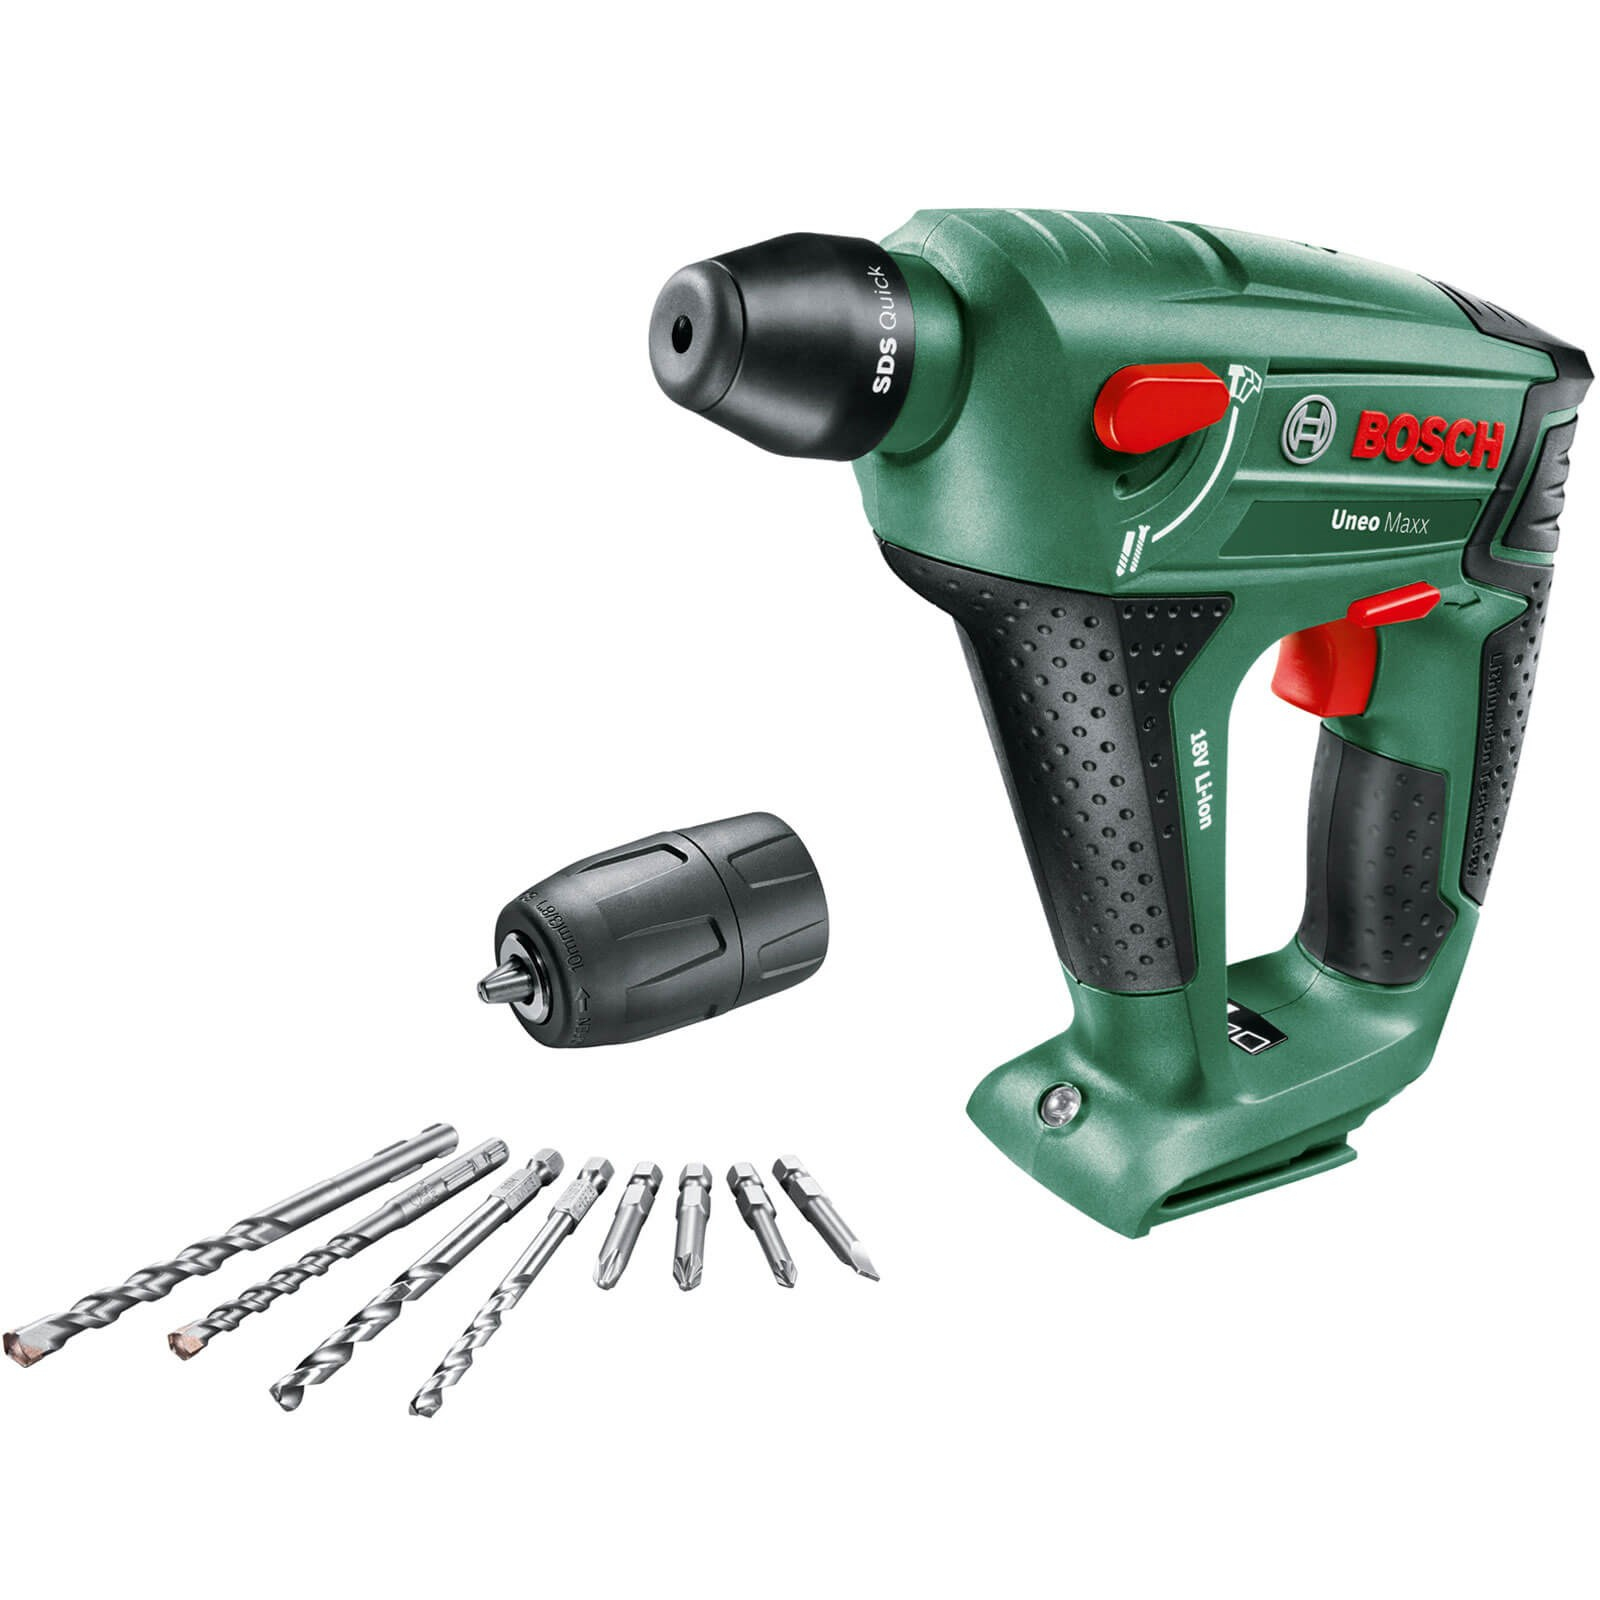 bosch uneo maxx 18 li 18v cordless rotary hammer drill